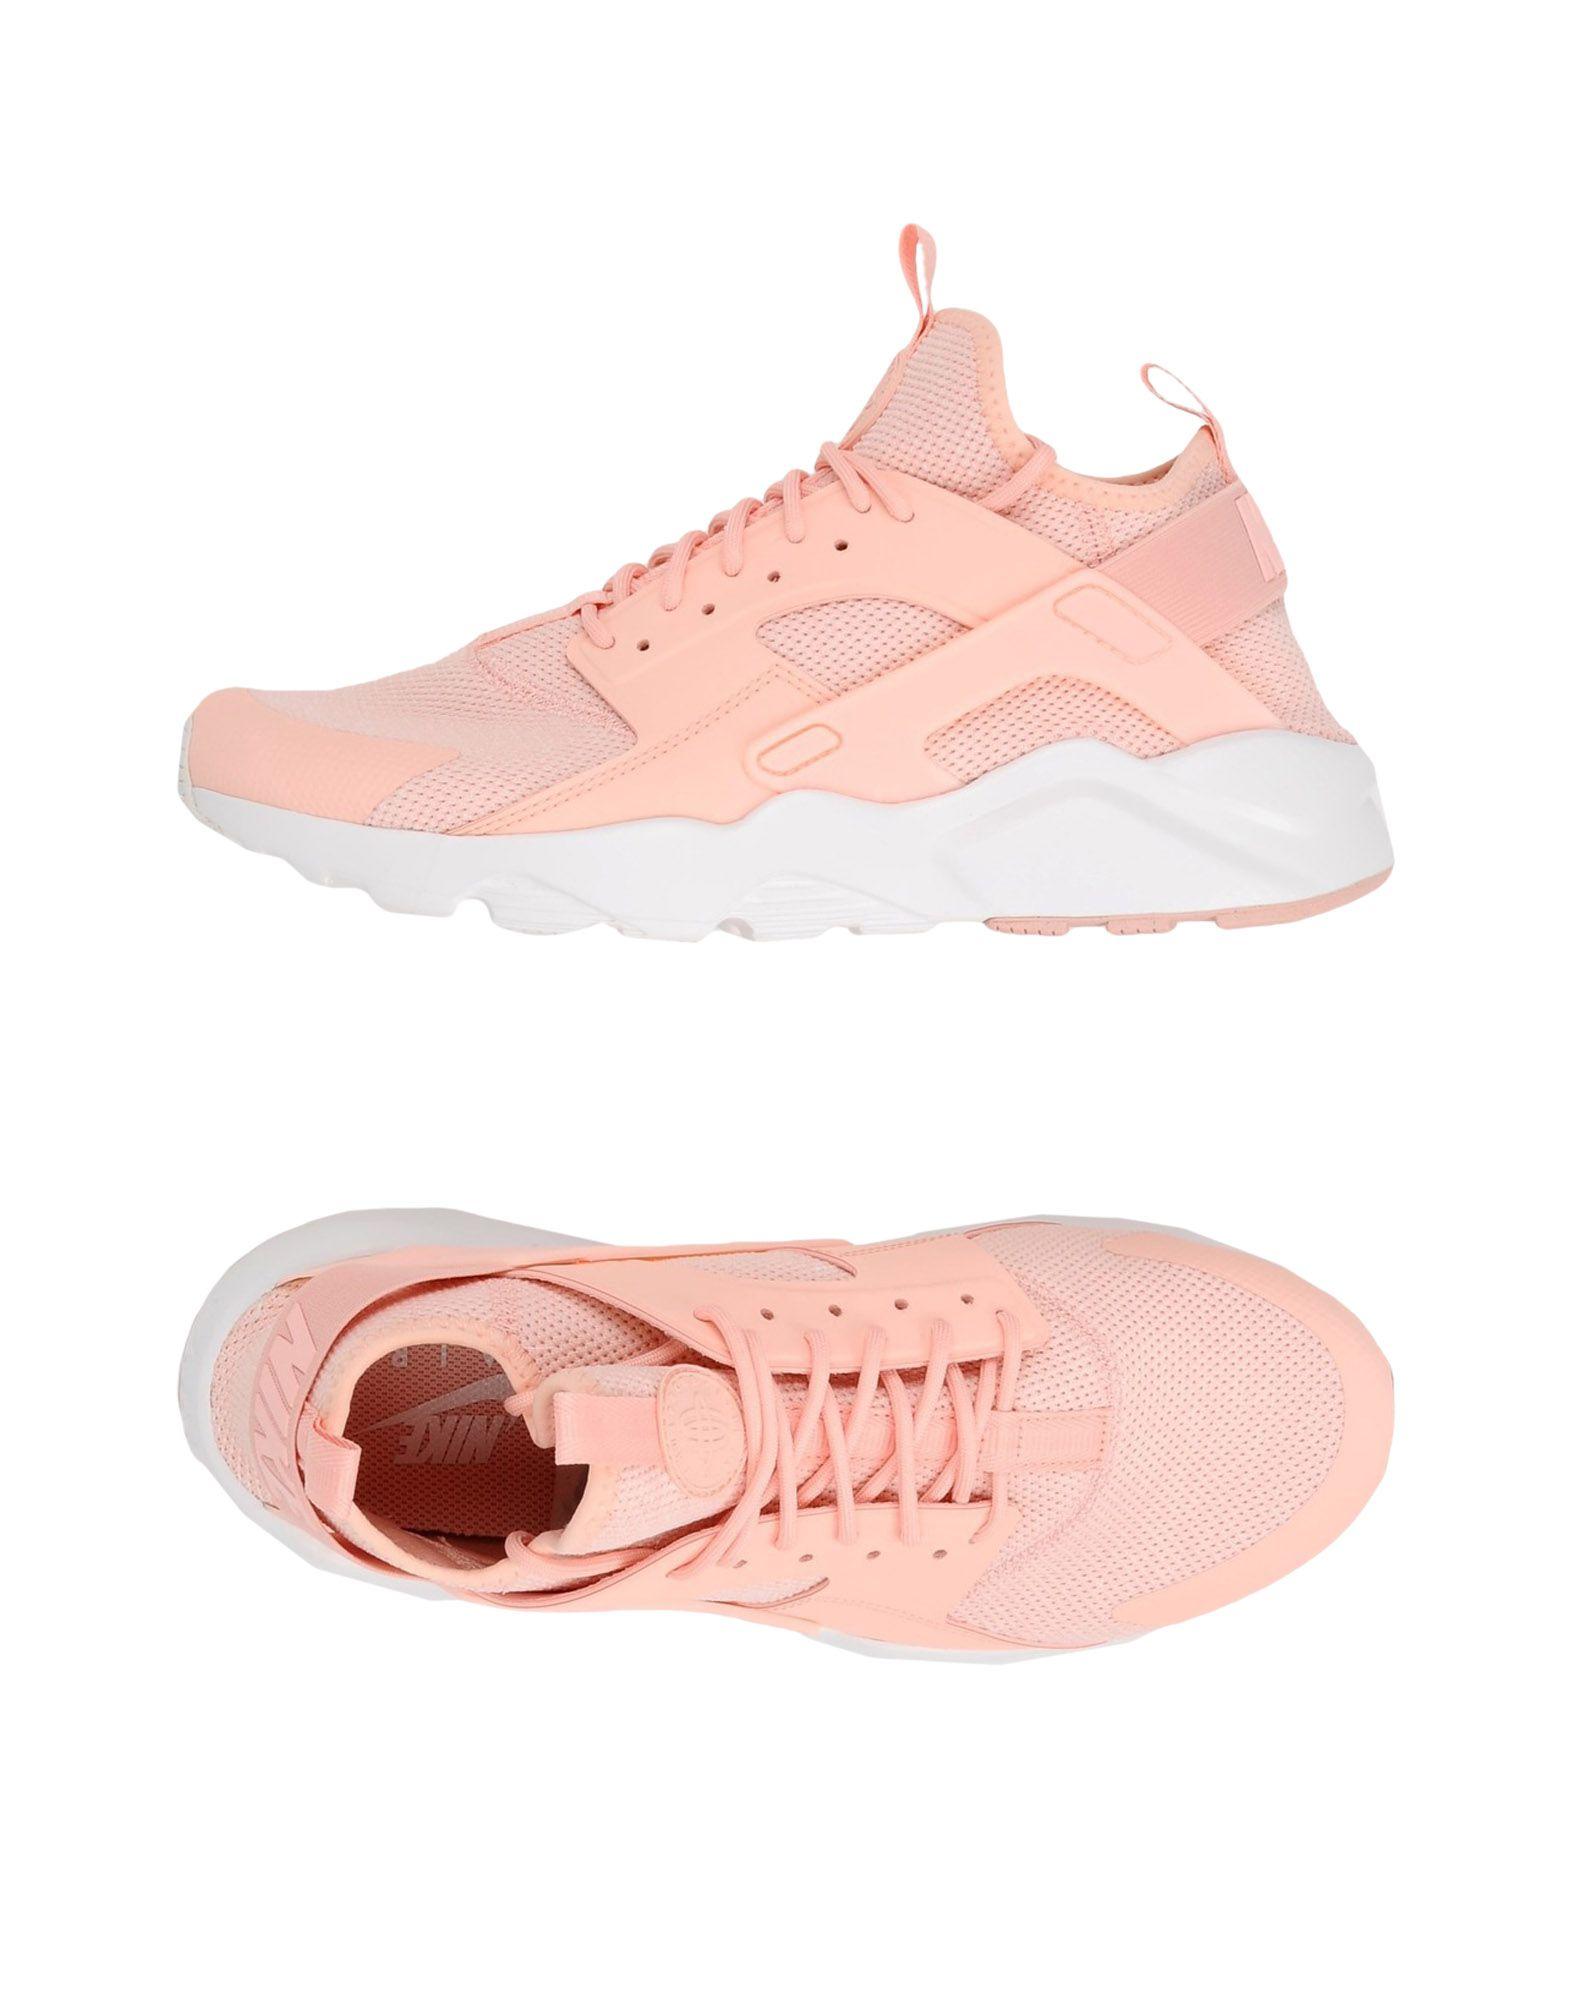 Sneakers Nike  Air Huarache Run Ultra Breathe - Uomo - 11293173LF